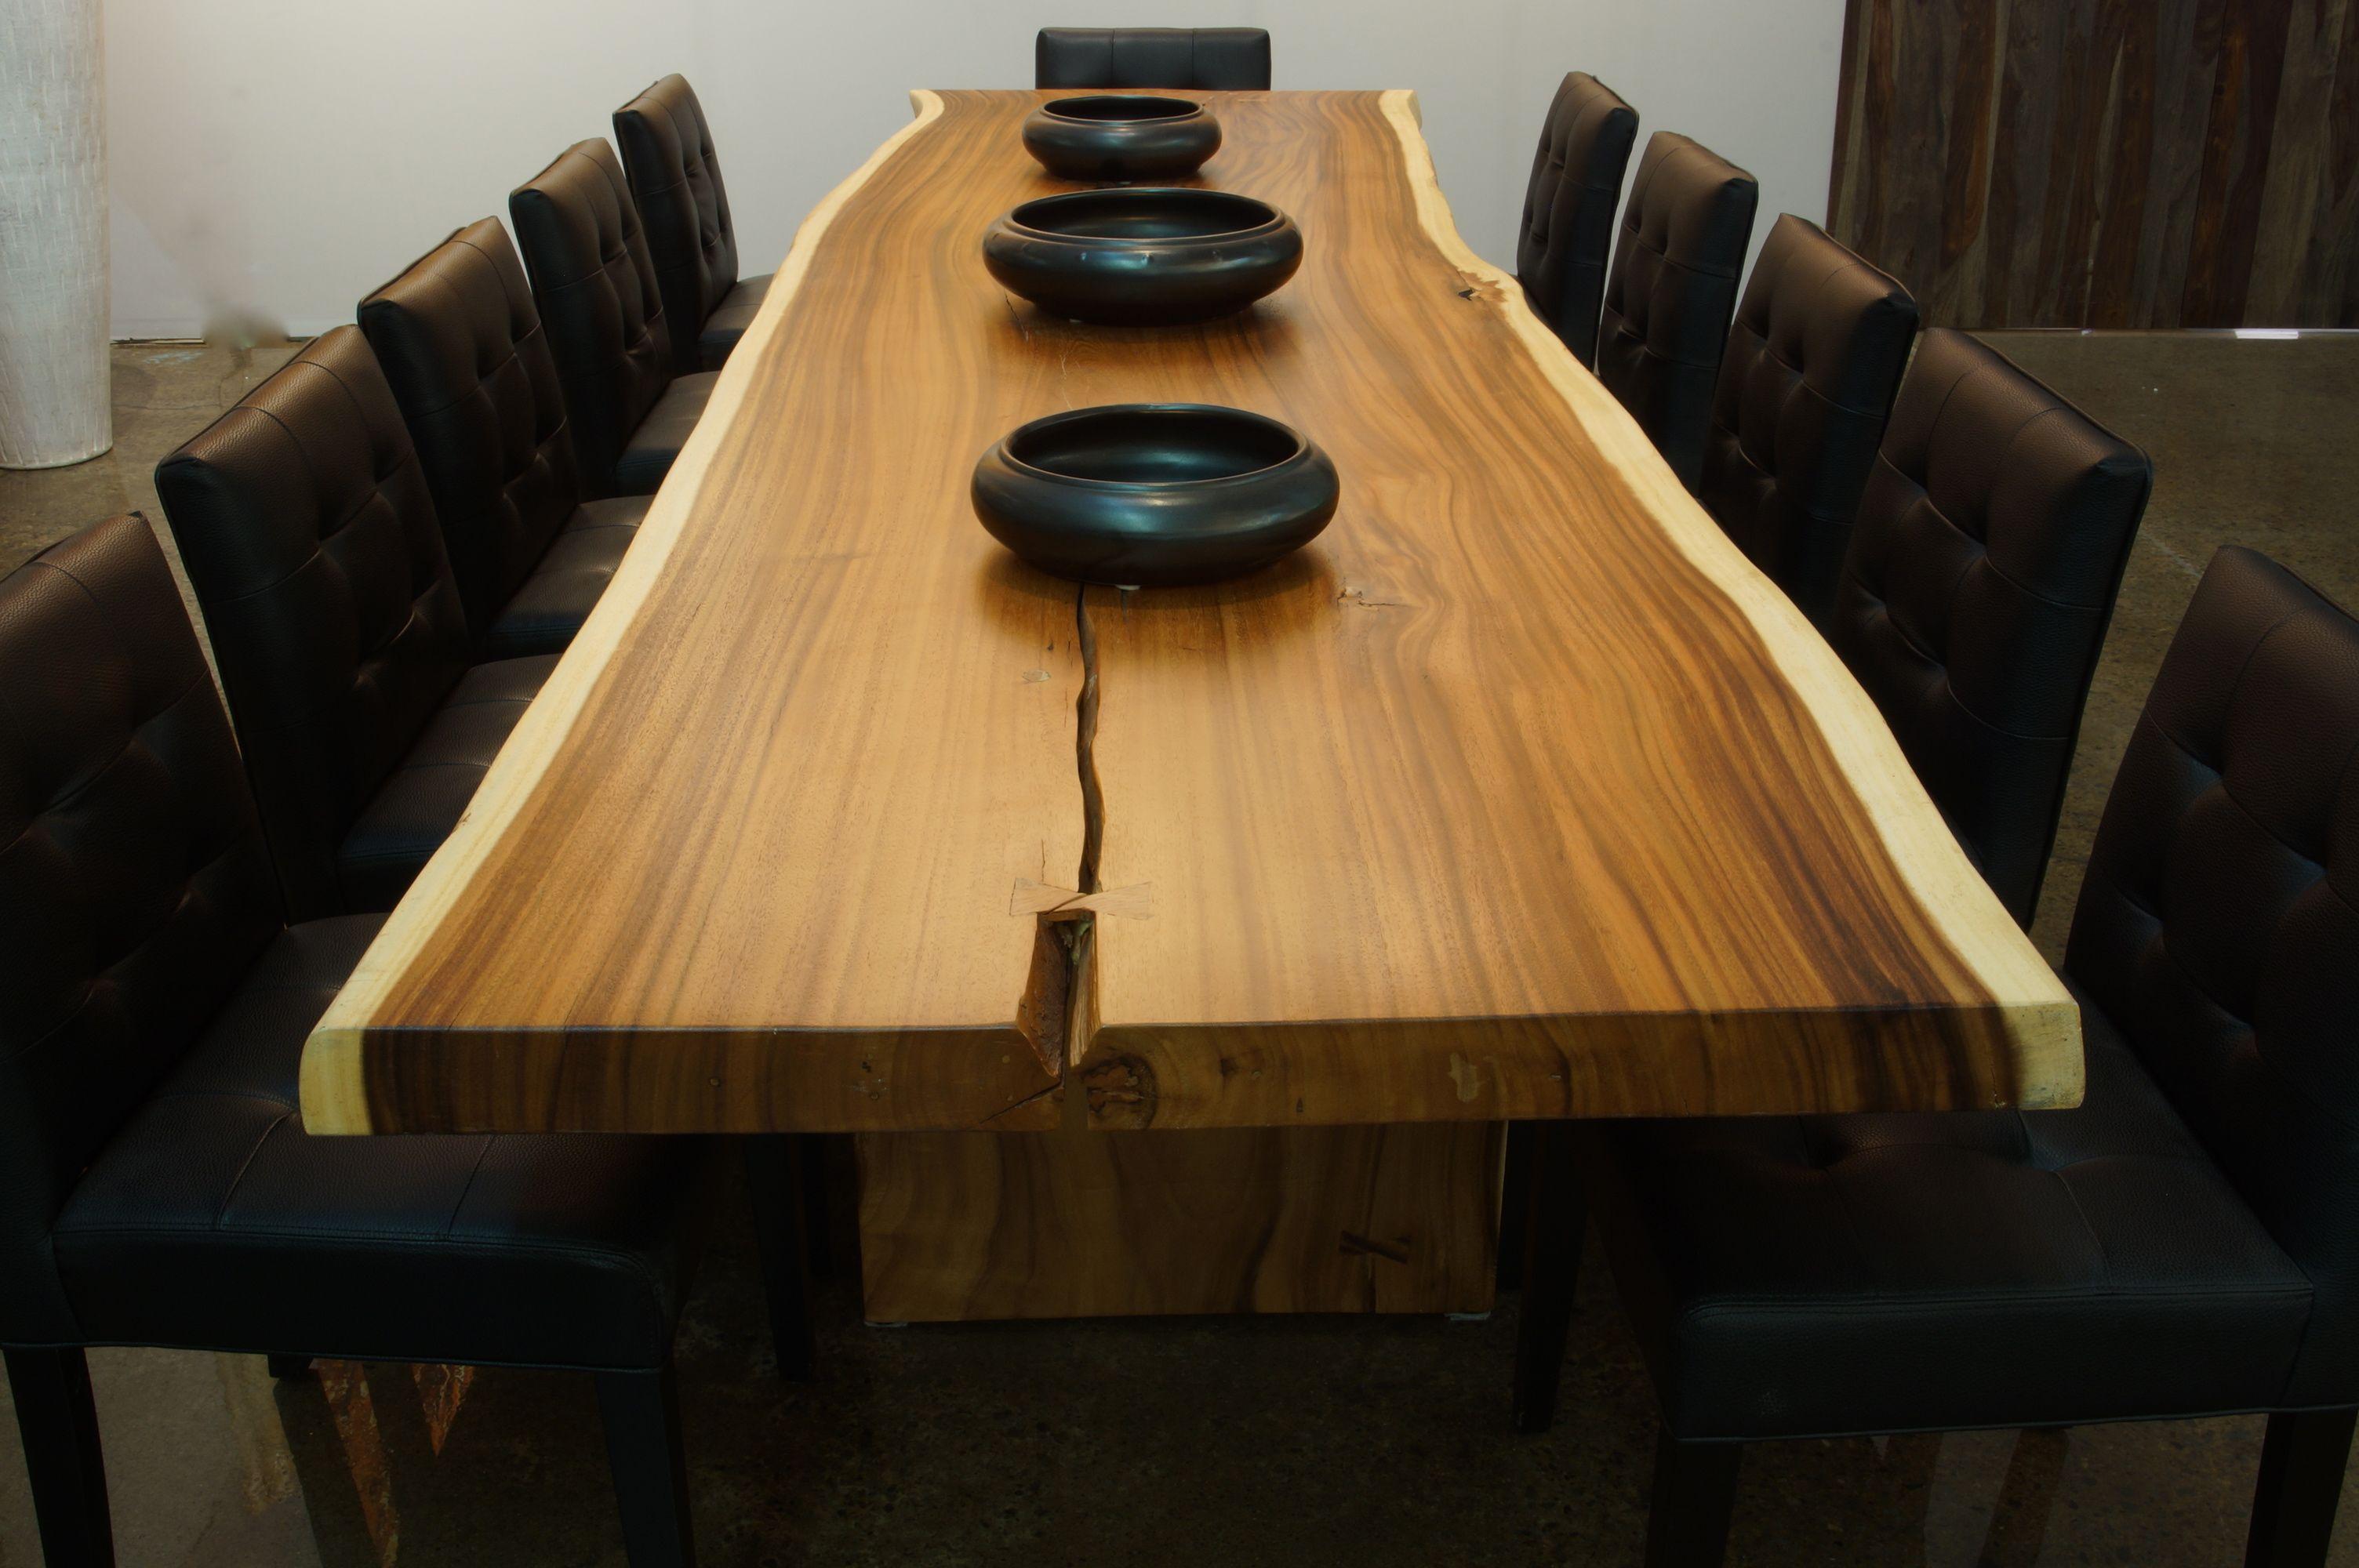 330d5f7746523b6df11387109ddb674d Impressionnant De Table Bar Exterieur Conception